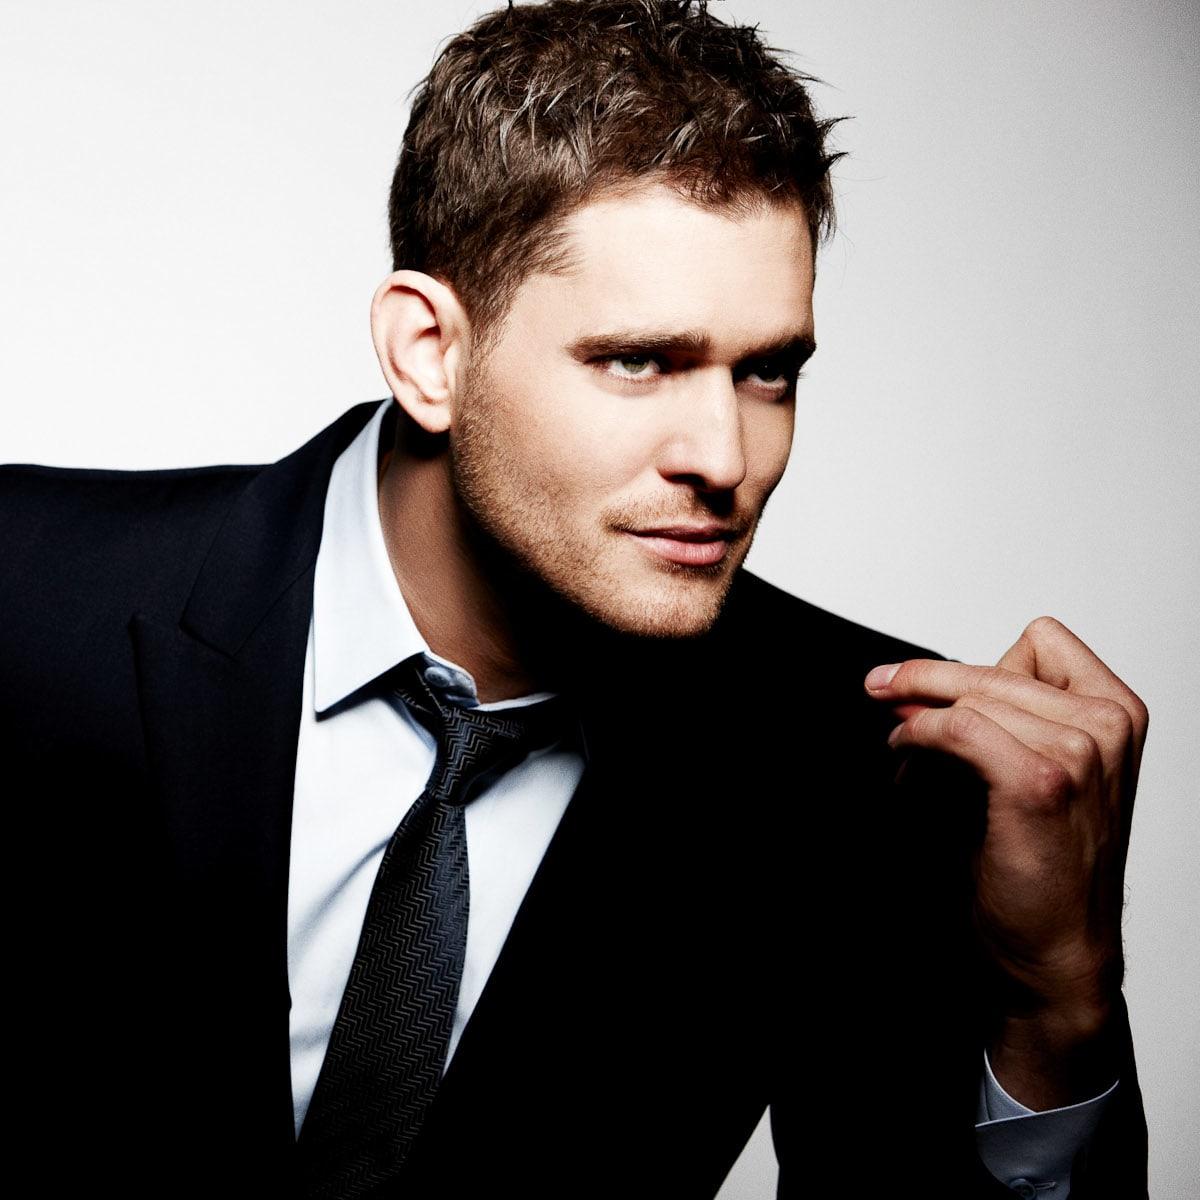 News_Michael D. Clark_Michael Buble_concert pick_by Ben Watts